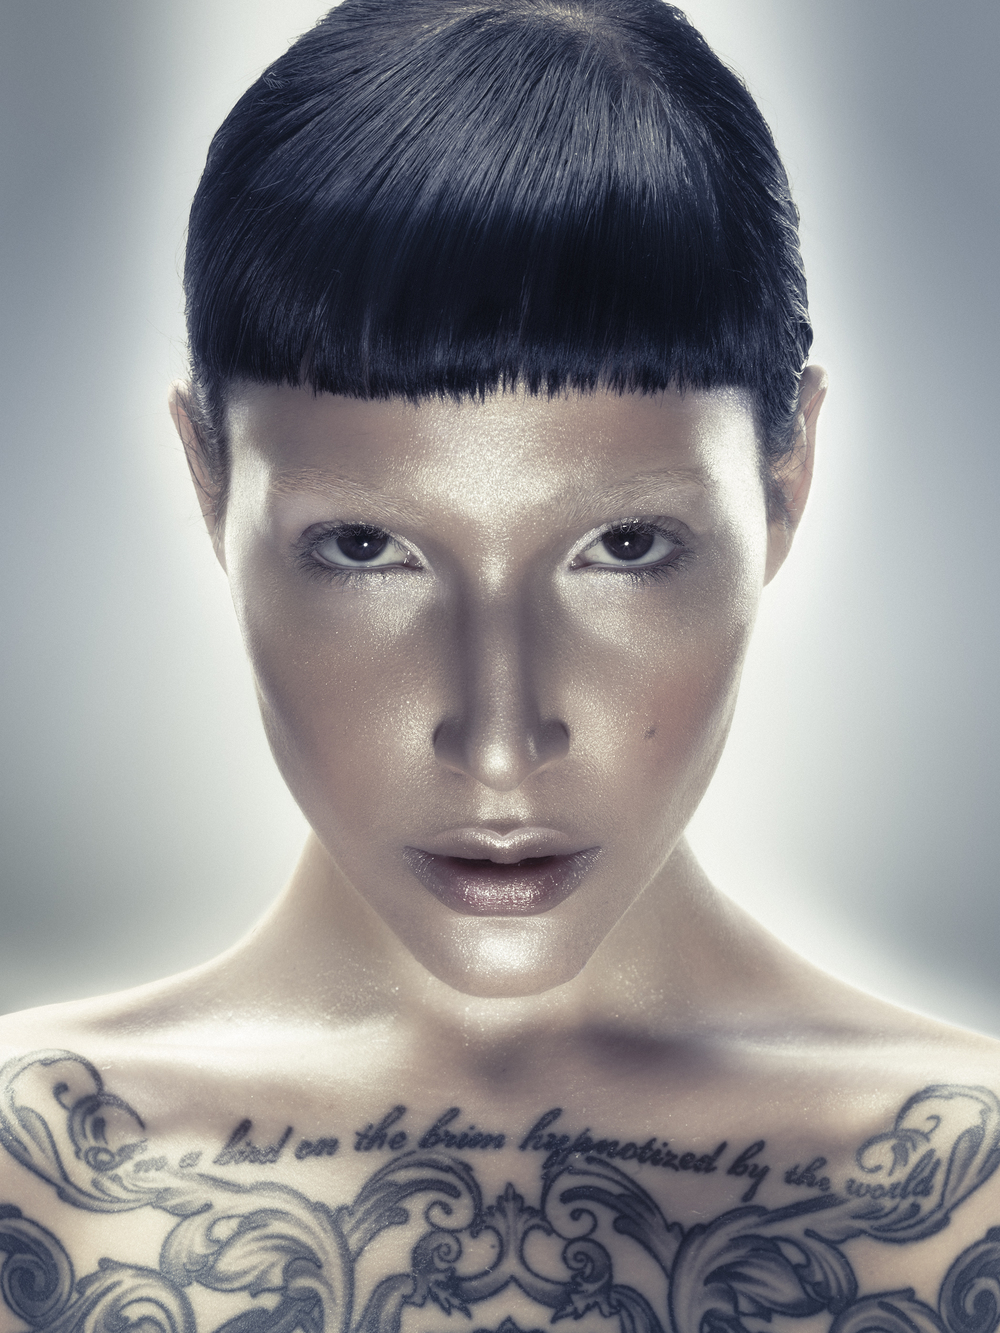 Mayela-Vazquez-Beauty-6.jpg